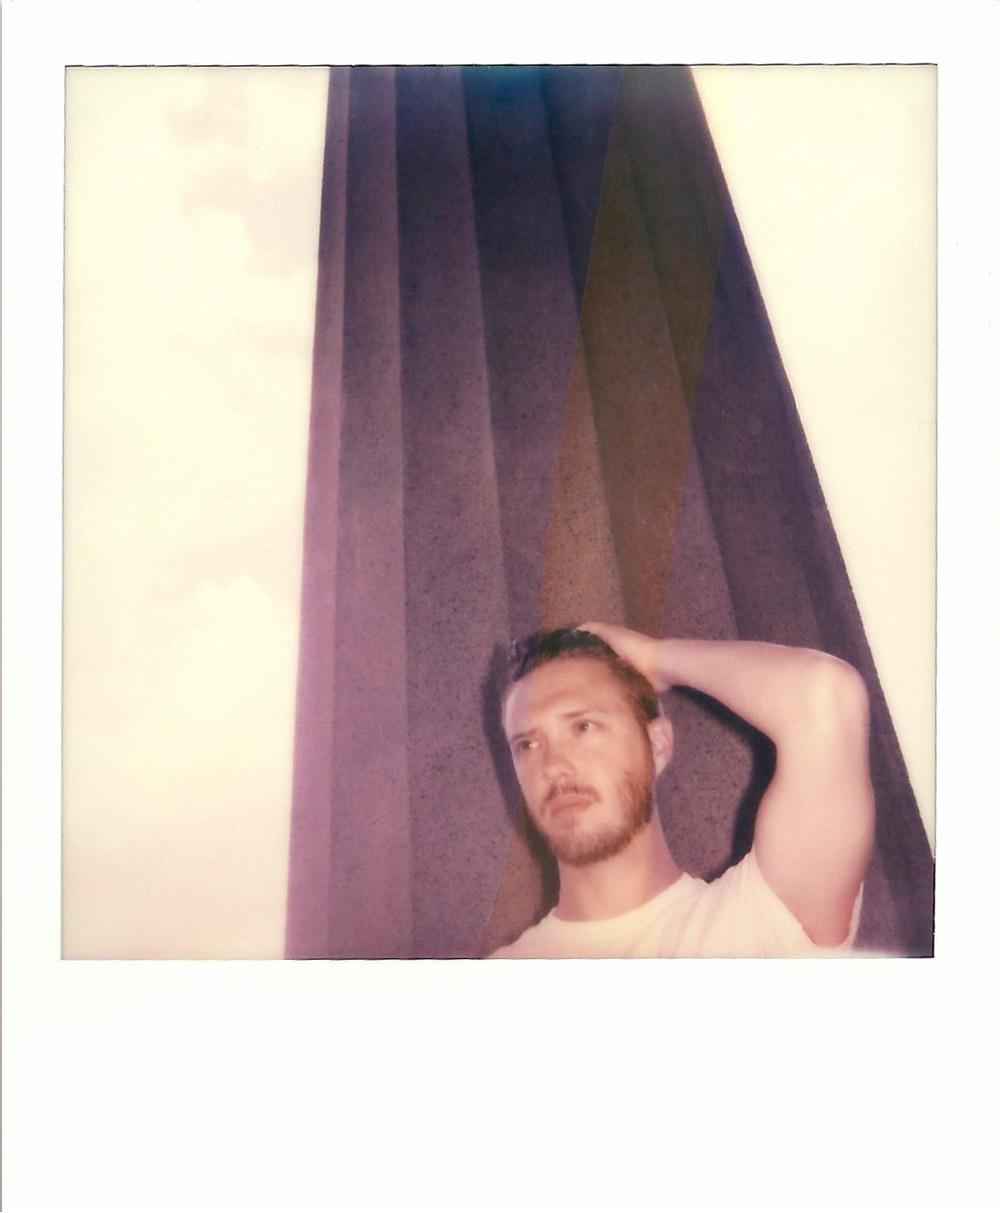 Brian Garbrecht - Parthenon Polaroid 600 instant film. 2016